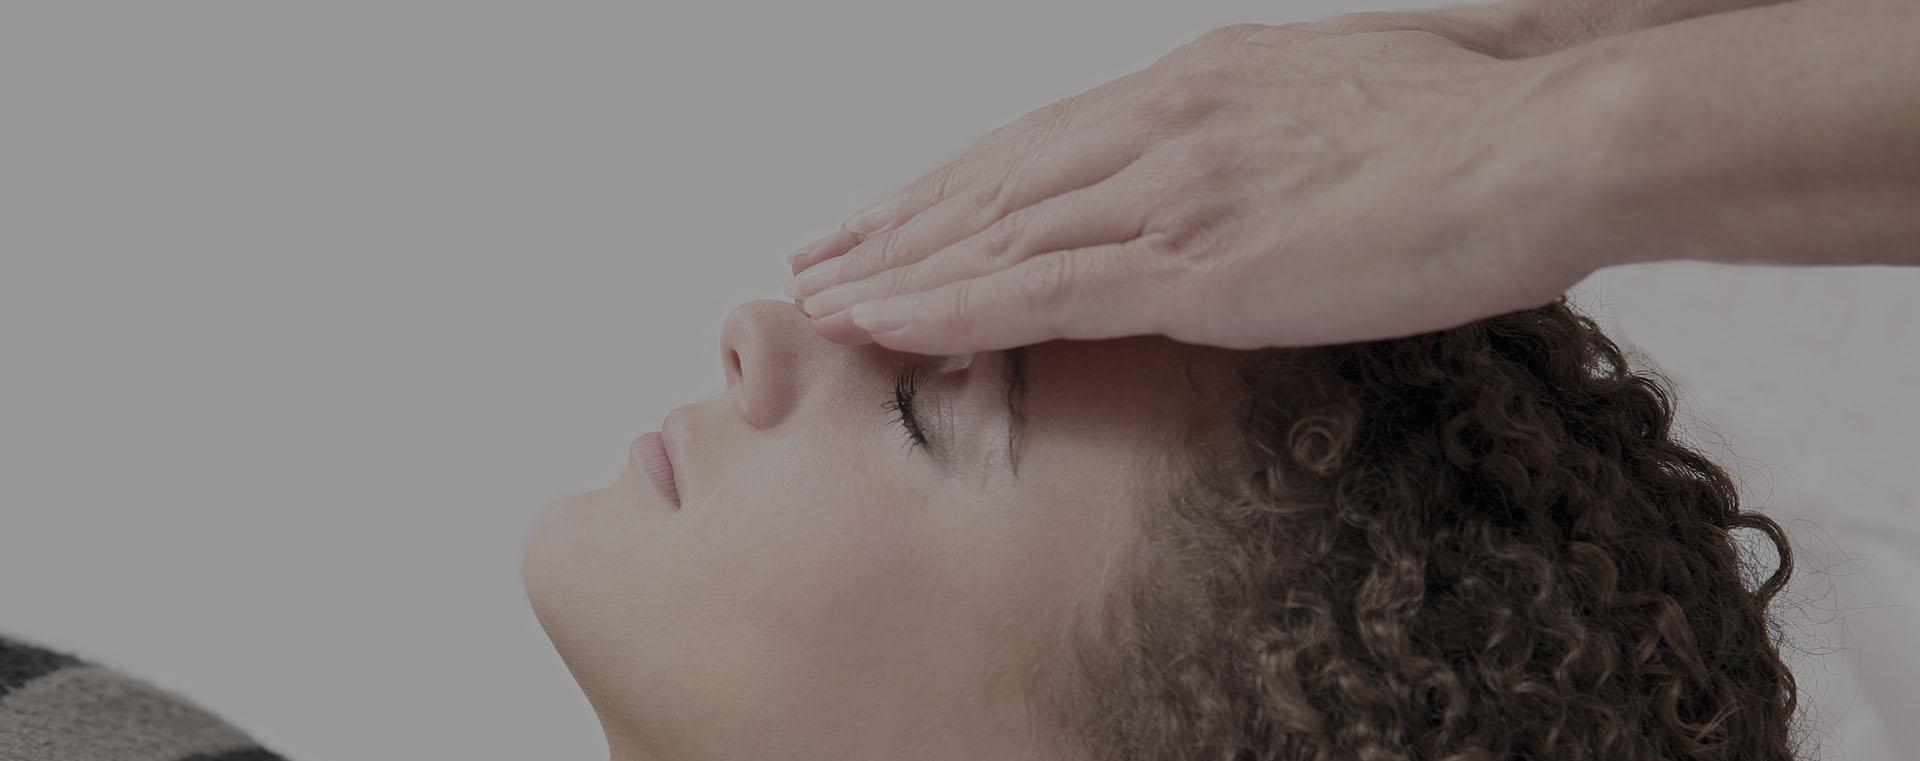 Reiki, Mindfulness, Reflexología Podal, Numerología